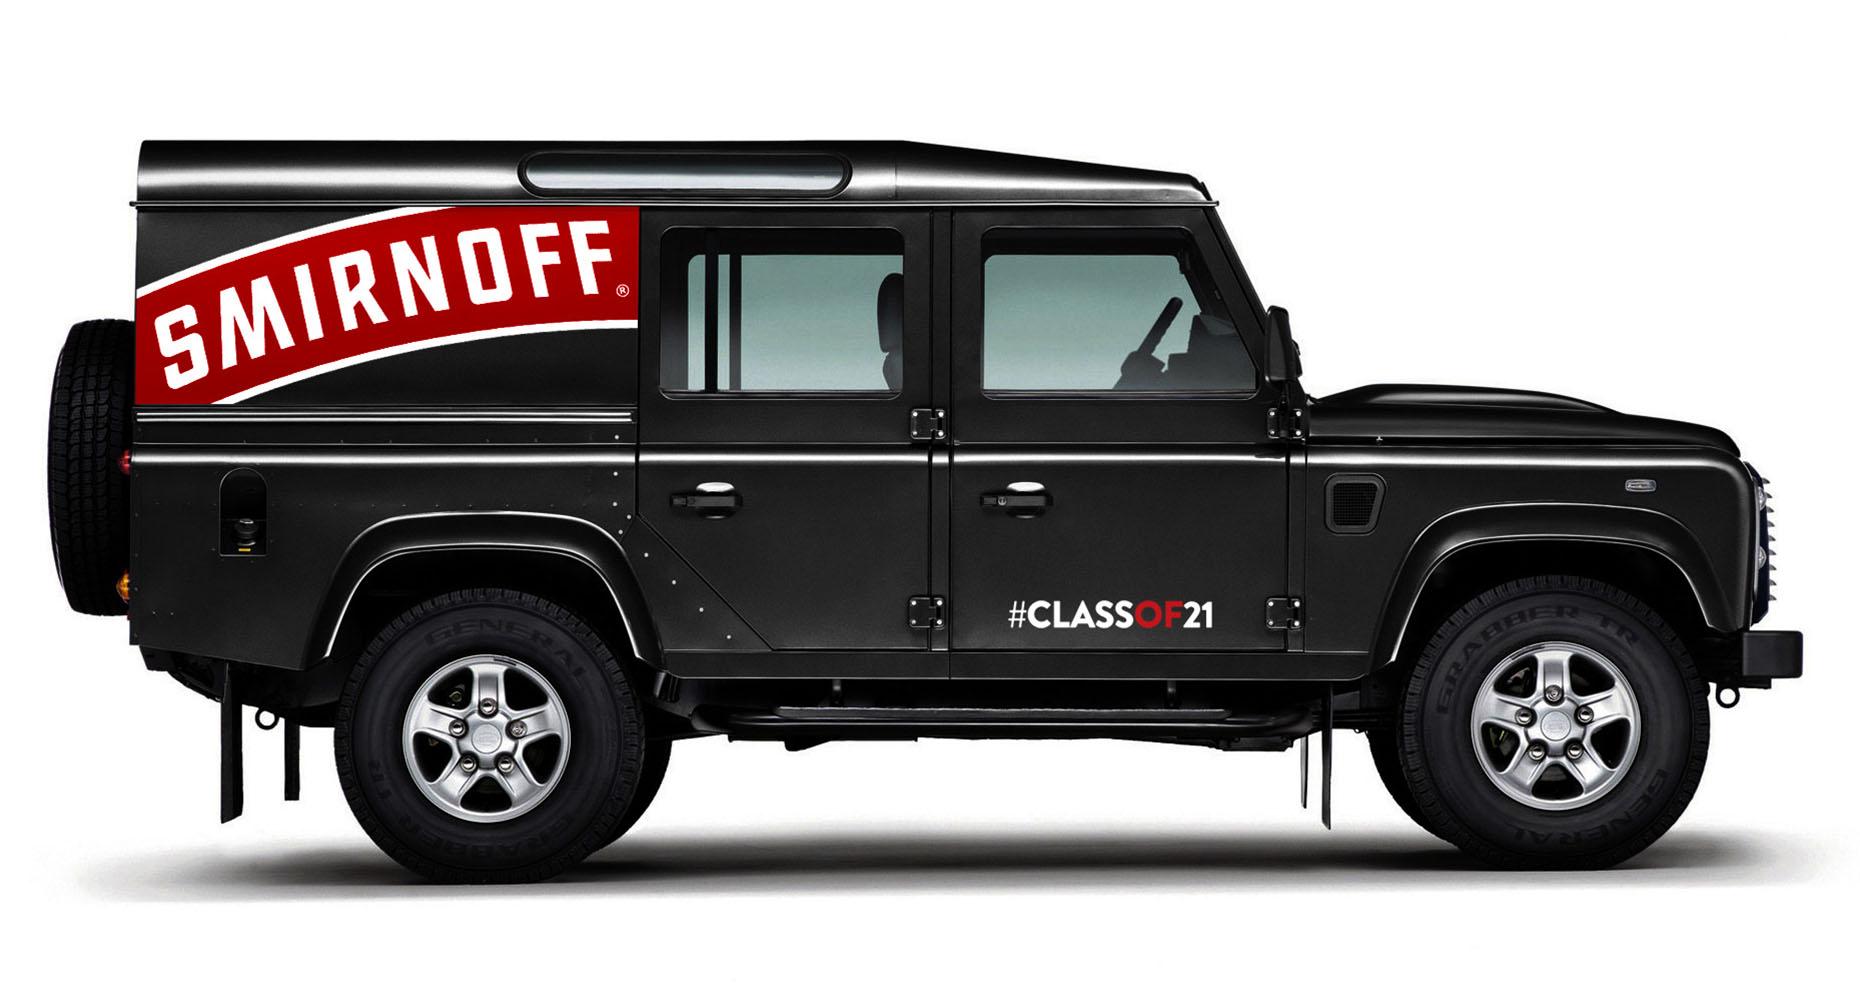 Smirnoff Vehicle Branding